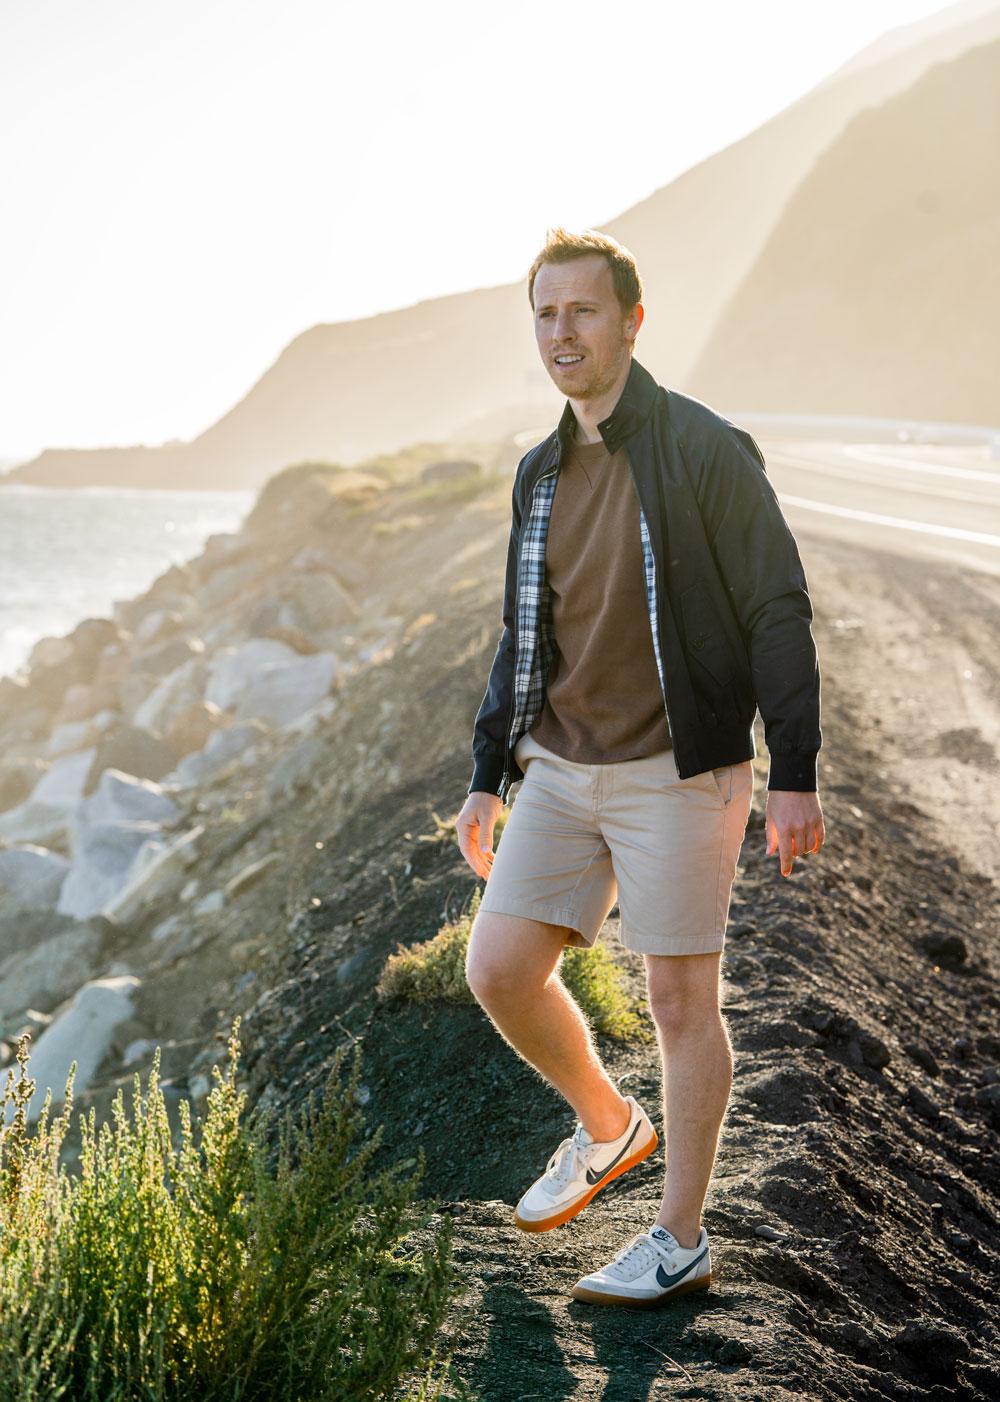 harrington jacket sweatshirt khaki shorts sneakers